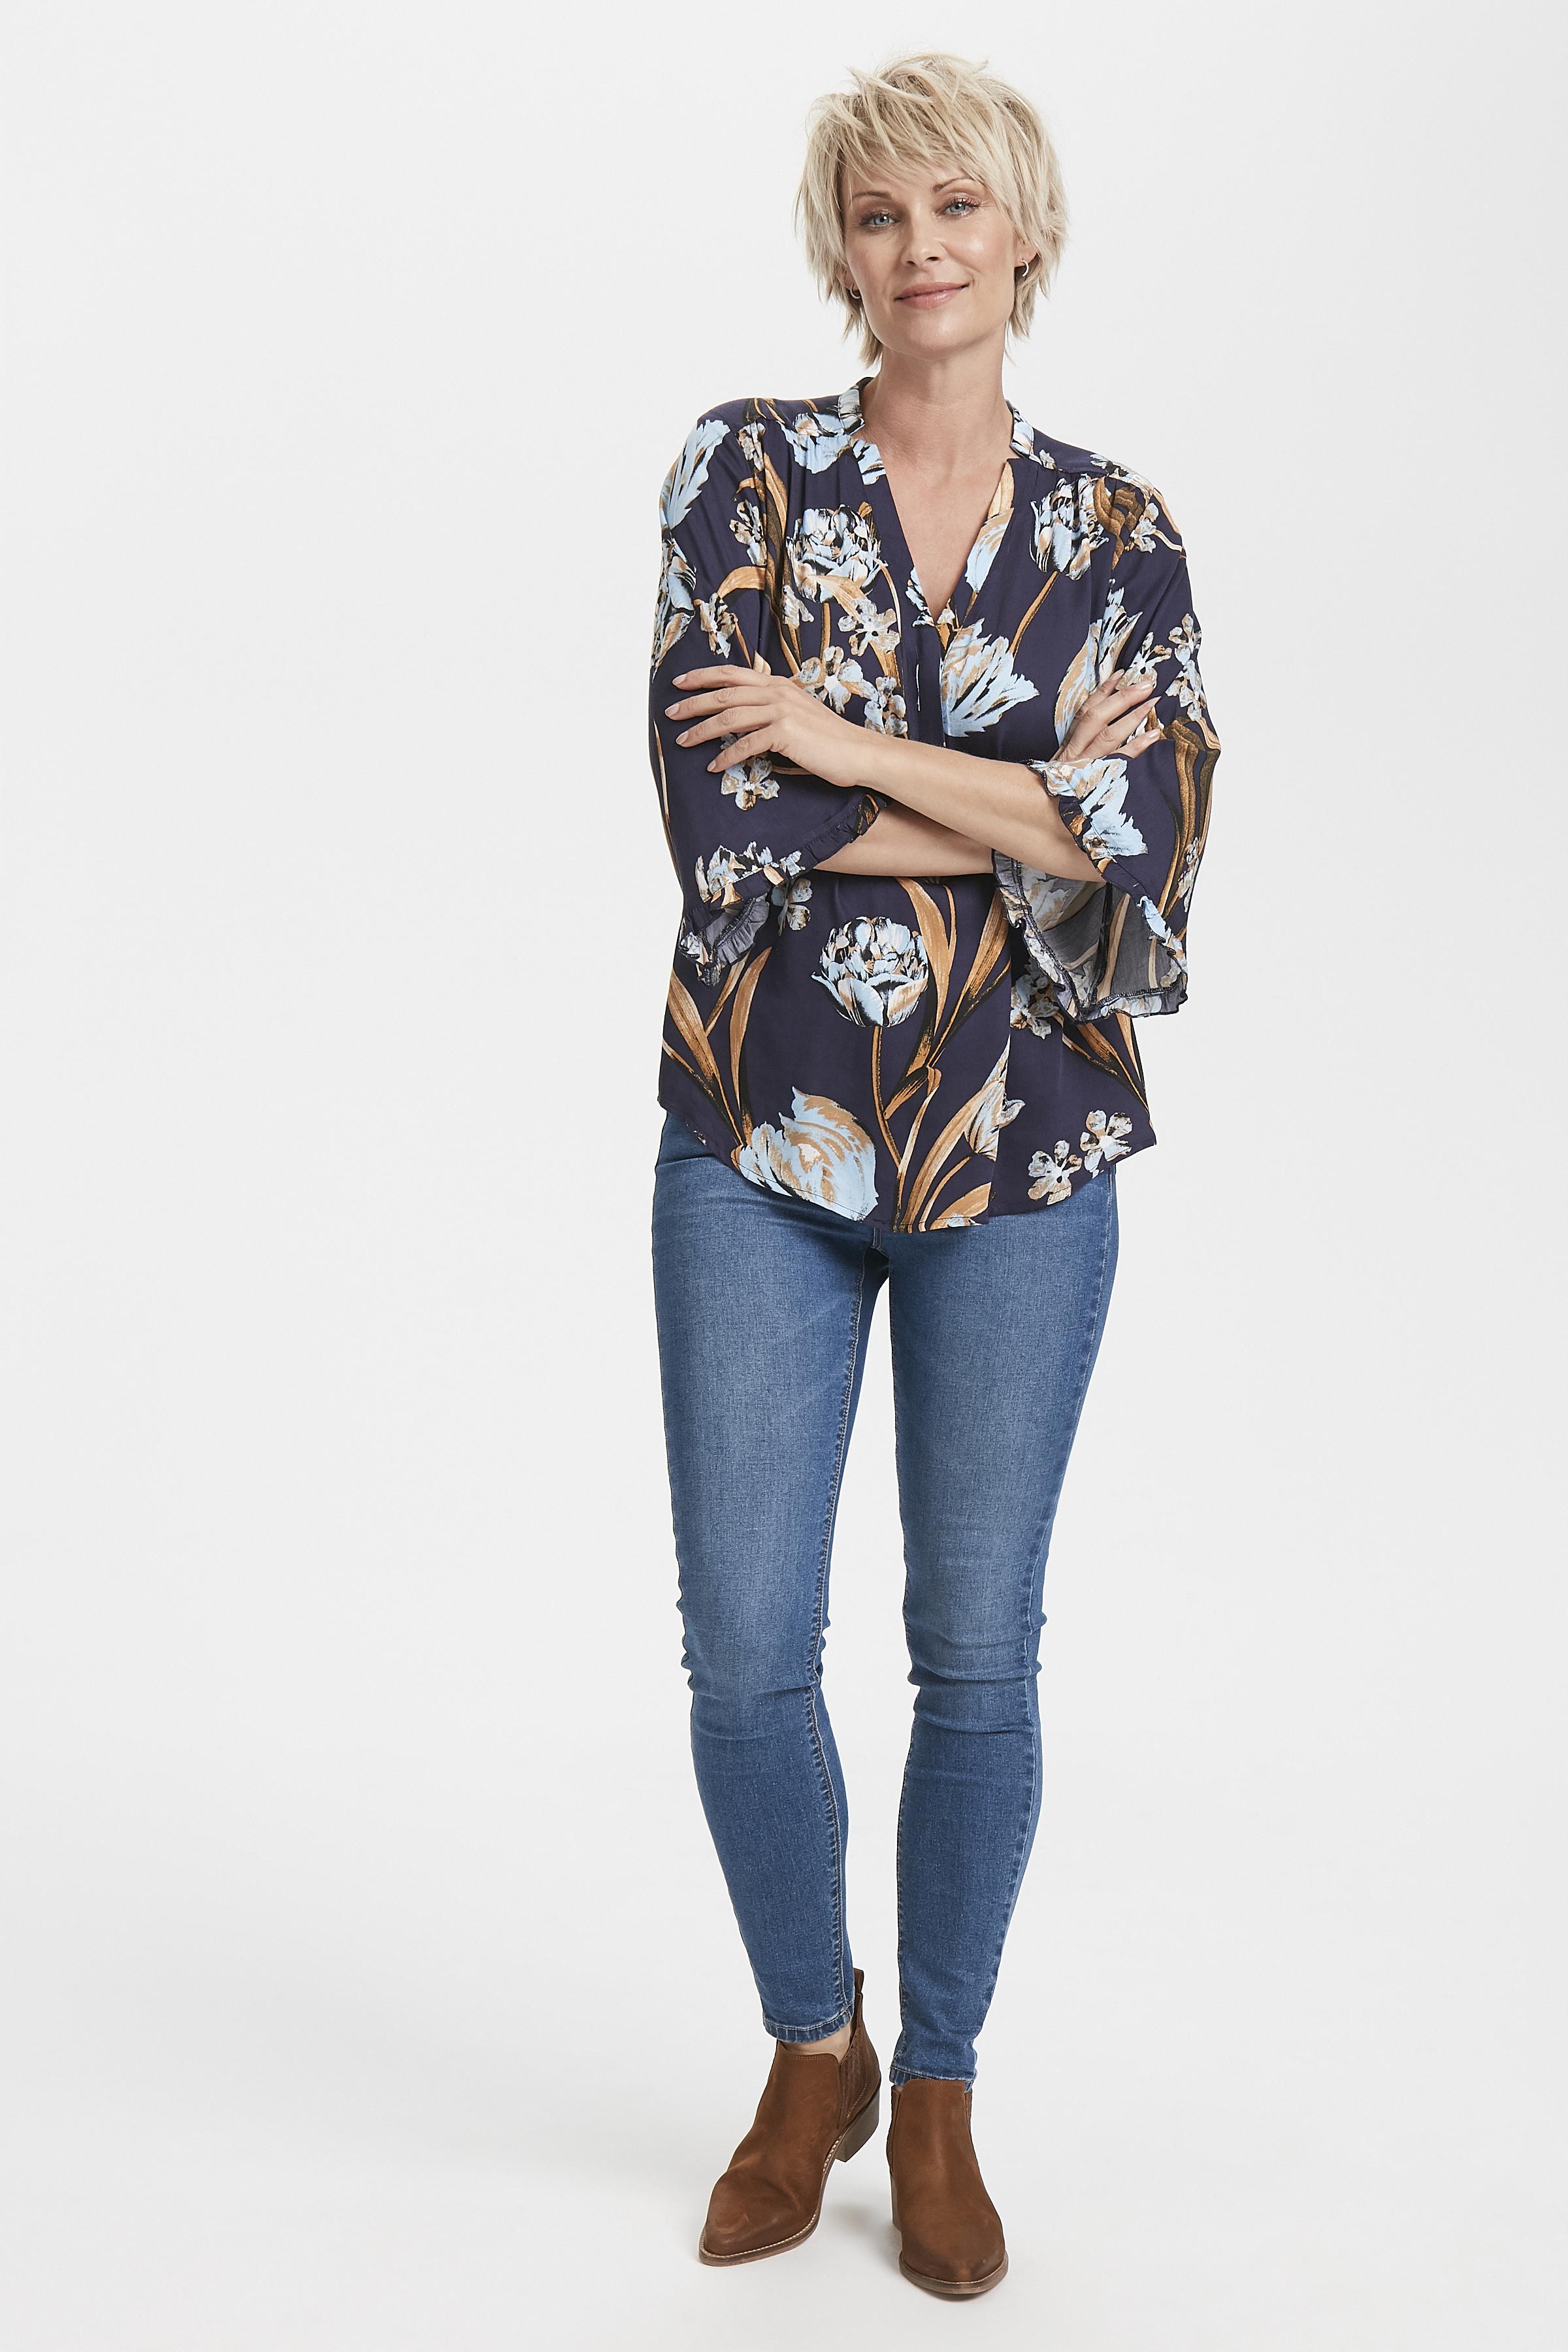 Marineblau/hellblau Langarm-Bluse  von Culture – Shoppen Sie Marineblau/hellblau Langarm-Bluse  ab Gr. XS-XXL hier